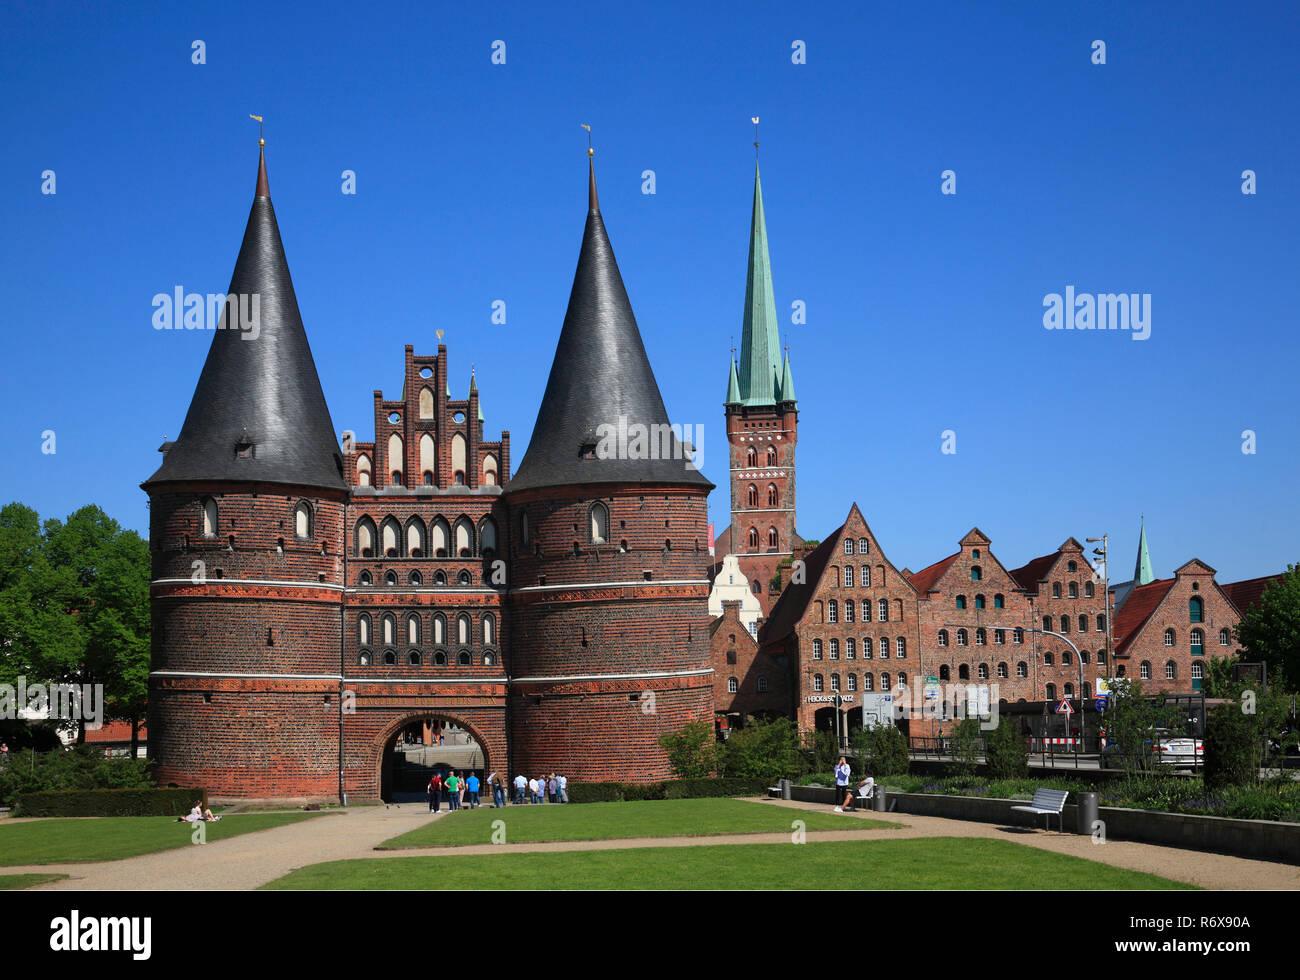 Holstentor, Holsten gate, city gate, Lübeck, Luebeck, Schleswig-Holstein, Germany, Europe - Stock Image